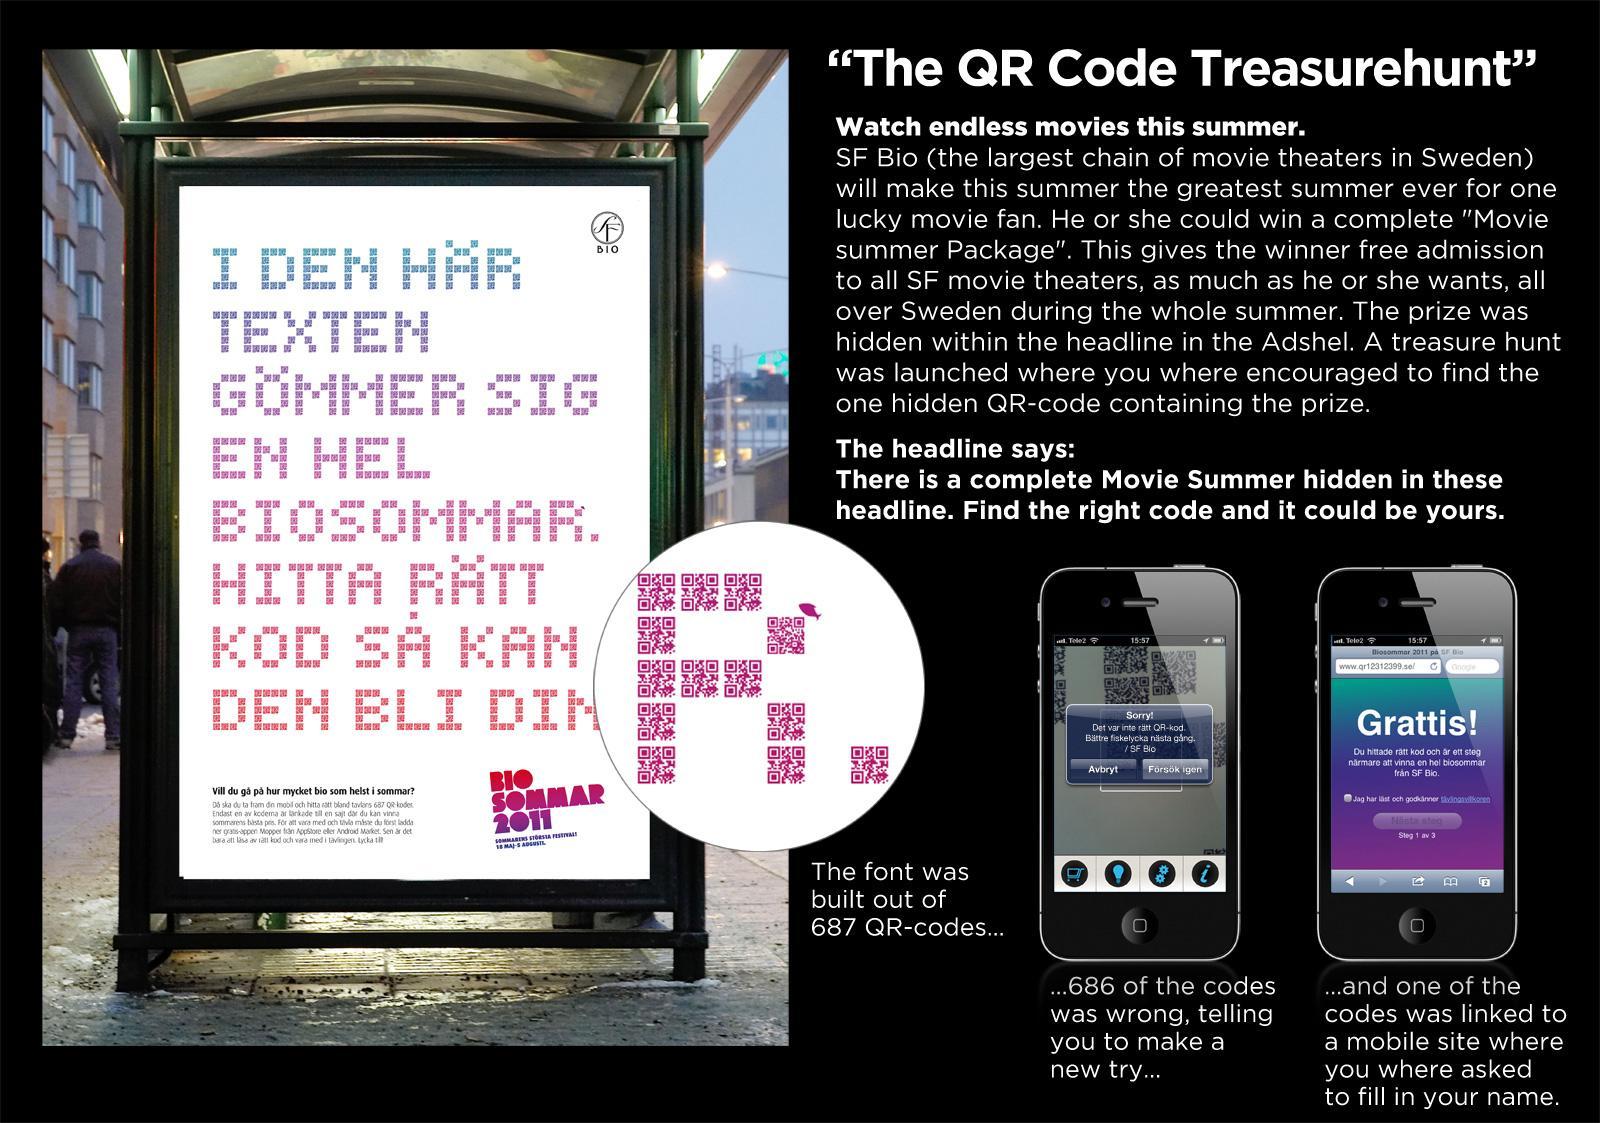 SF Bio Outdoor Ad -  The QR Code Treasurehunt